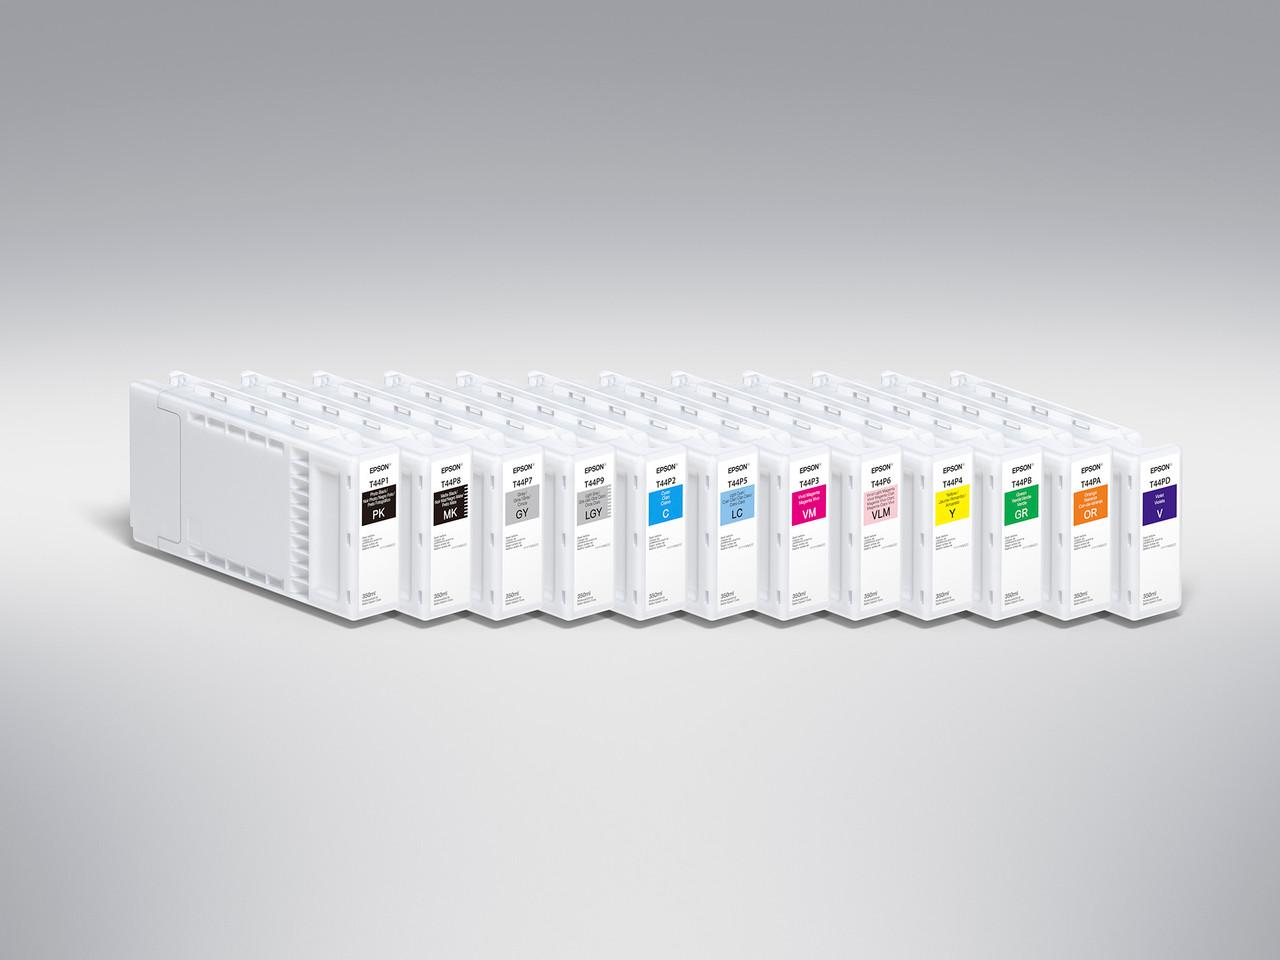 Epson T44W720 Gray Ink Cartridge, 150 mL